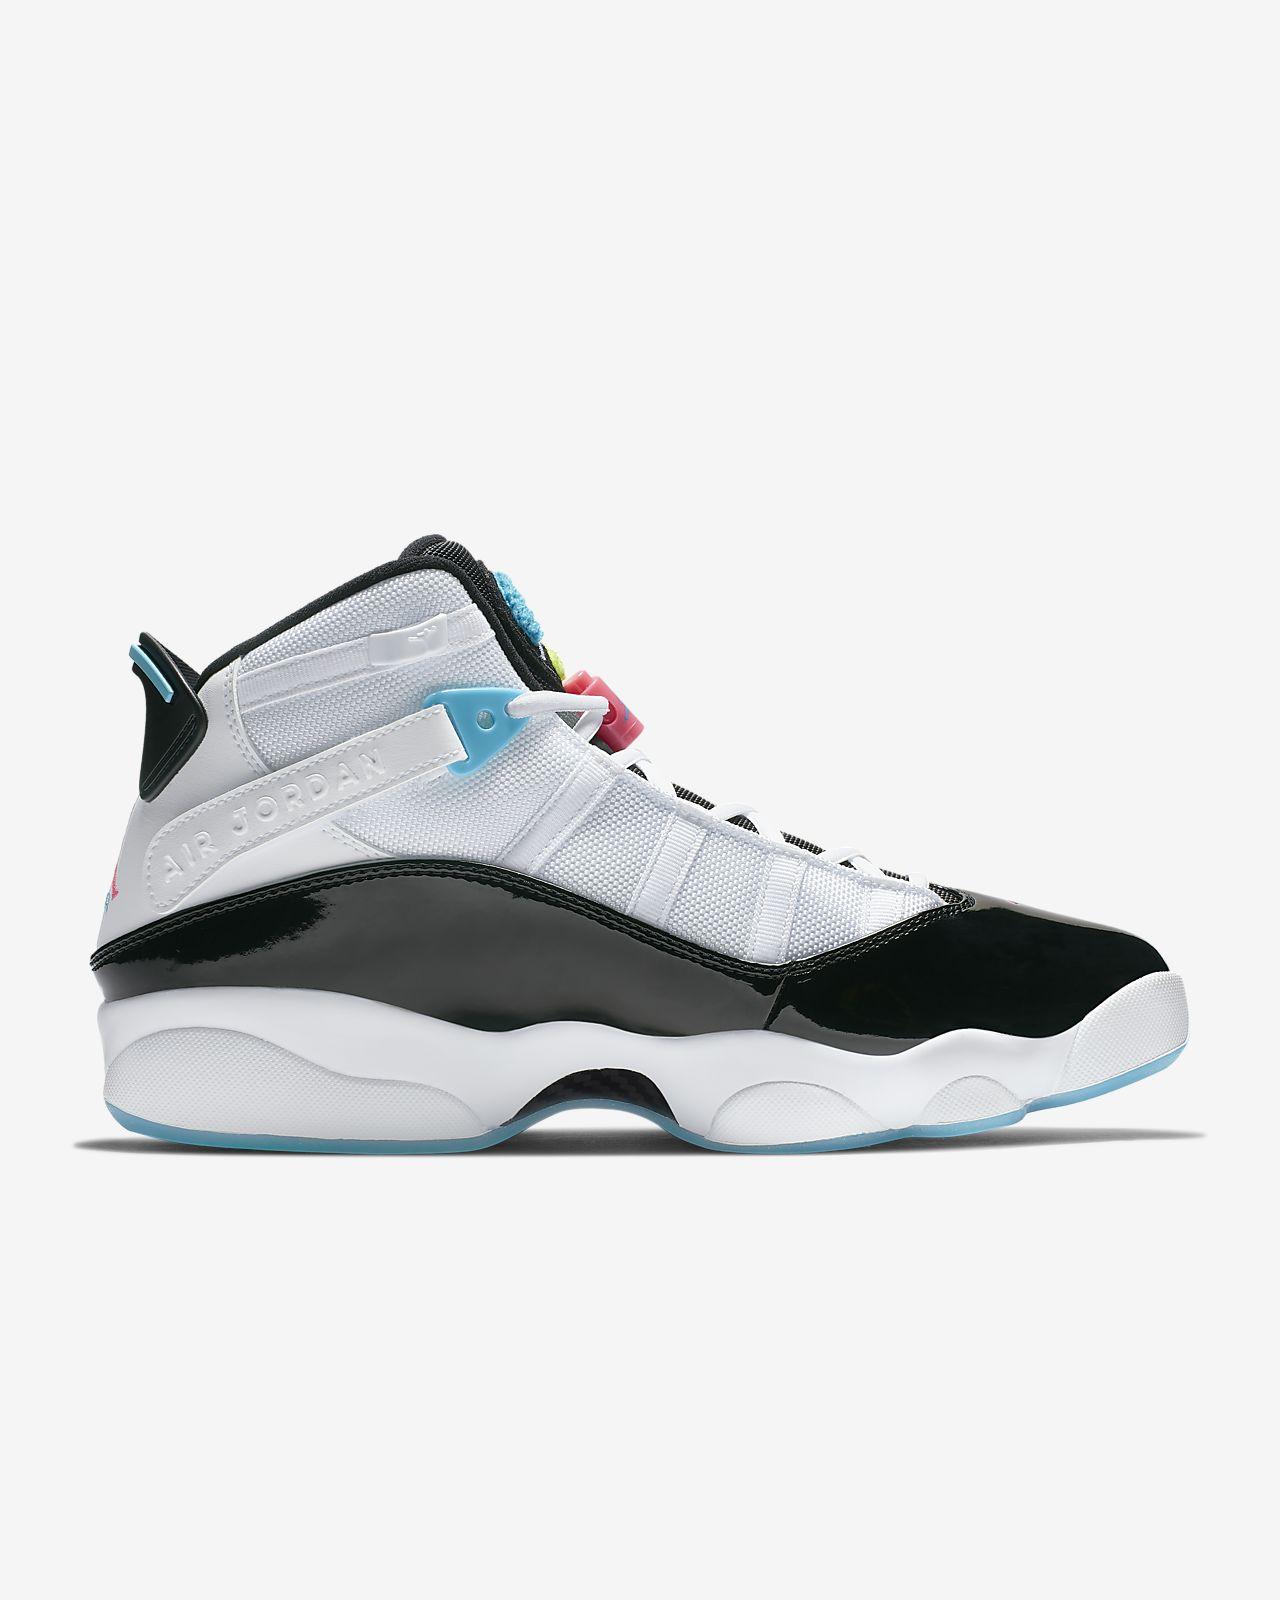 detailed pictures d2018 50887 ... Jordan 6 Rings Men s Shoe